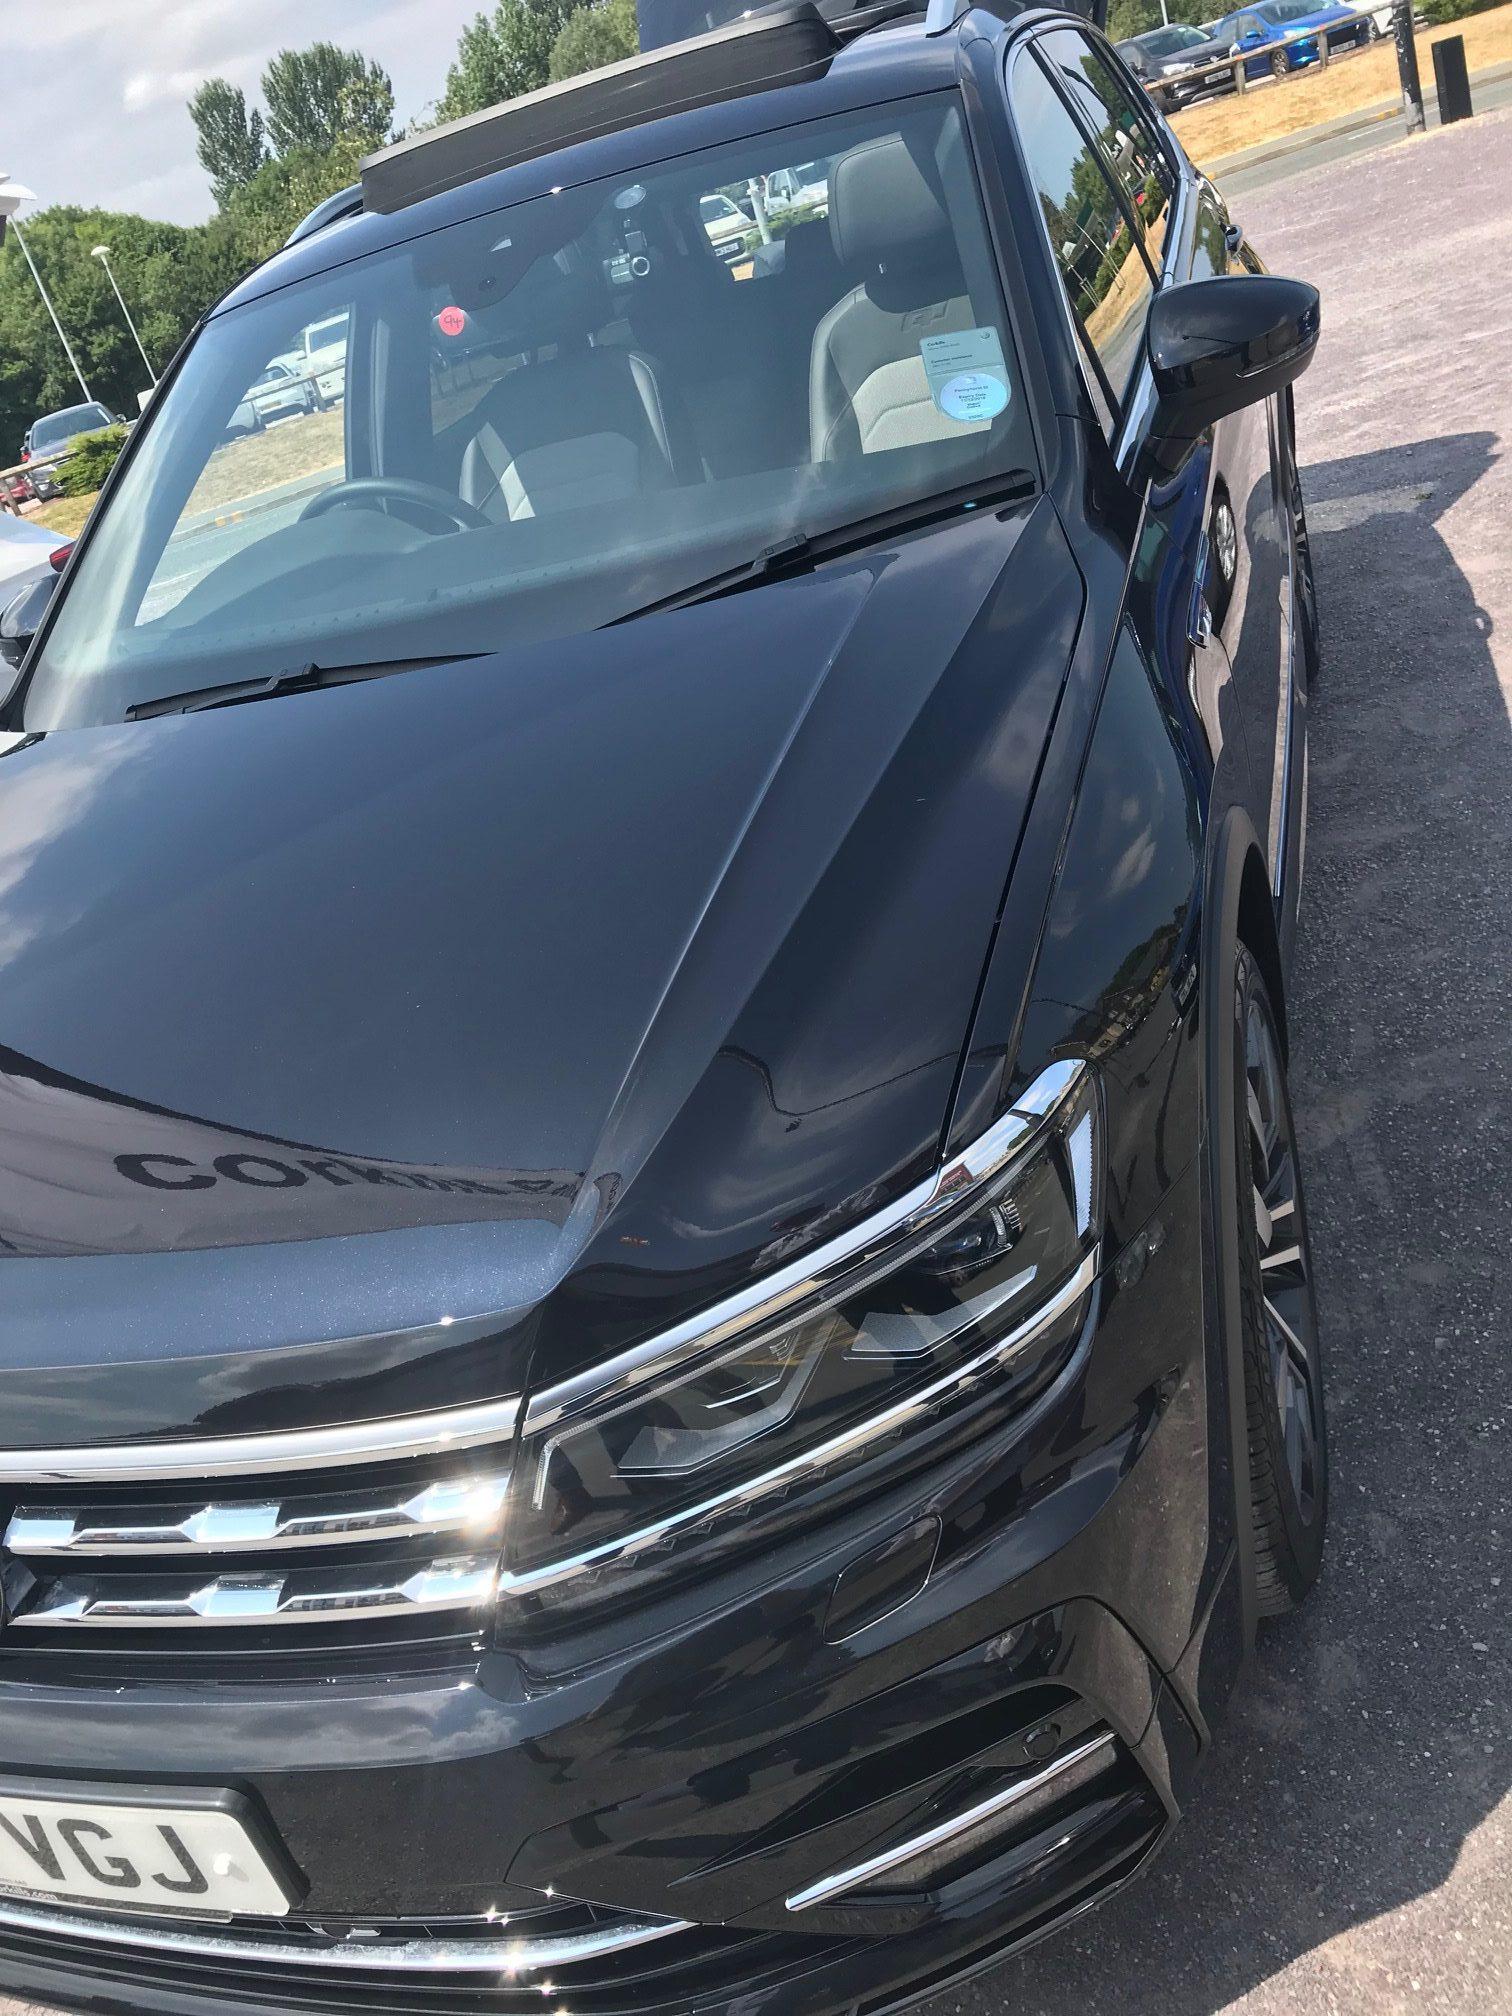 Volkswagen TIGUAN ALLSPACE DIESEL ESTATE 2.0 TDi R Line 5dr DSG Car Leasing (7 seat)Information